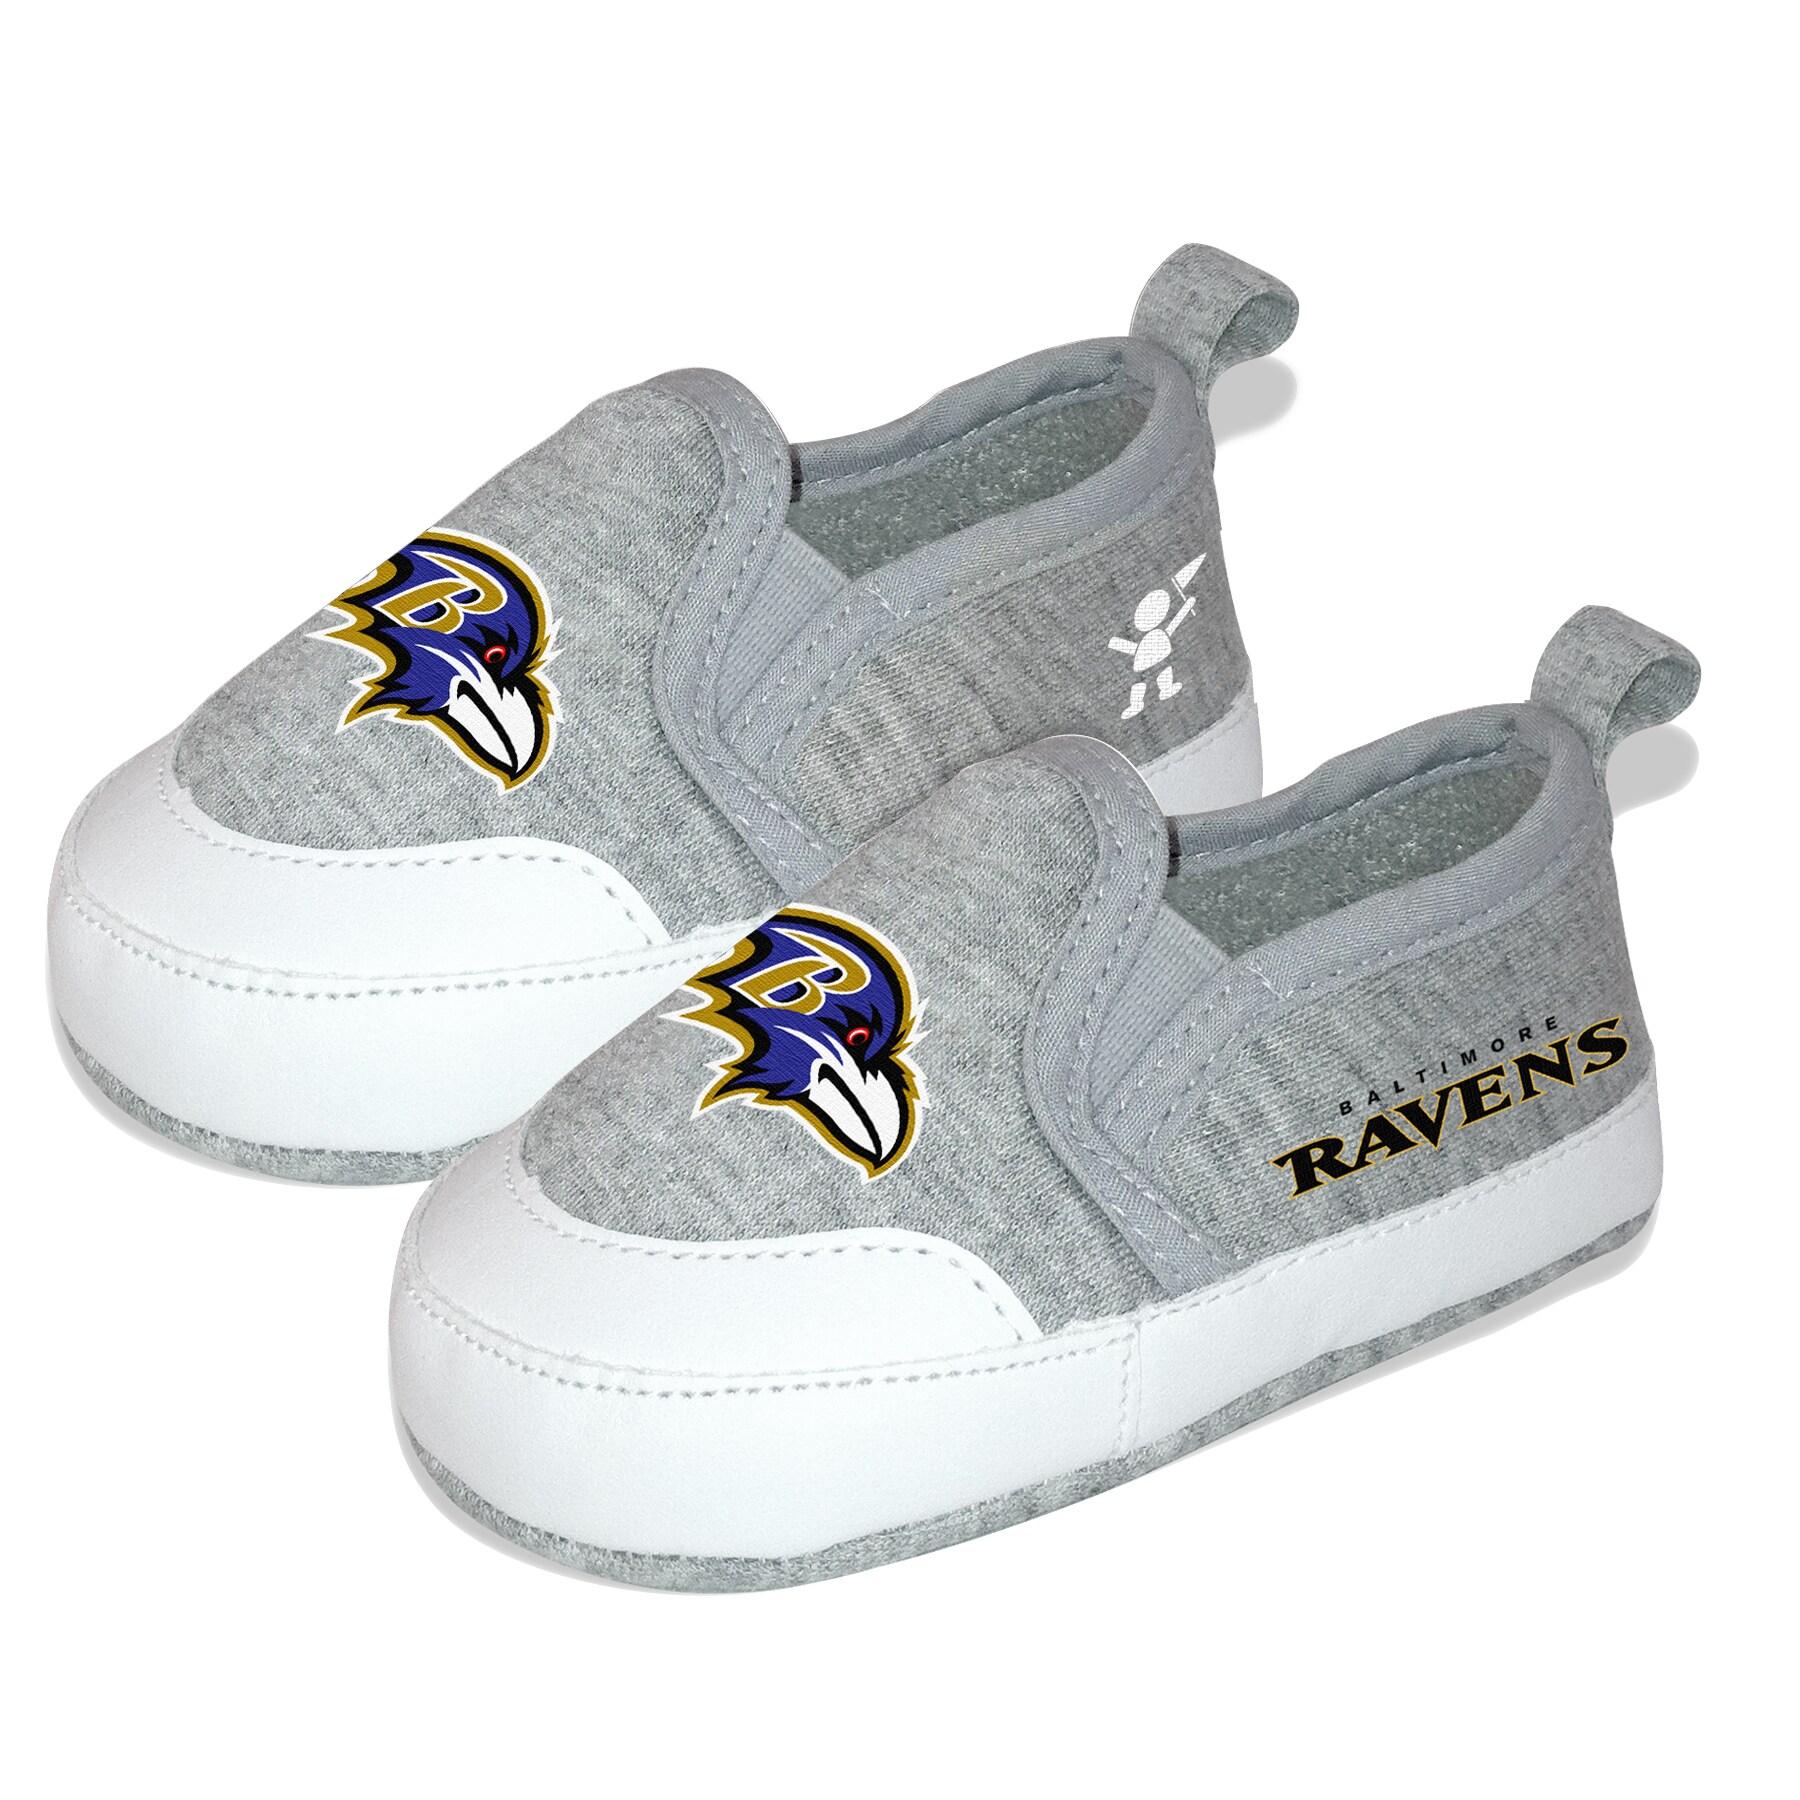 Baltimore Ravens Pre-walk Baby Shoes